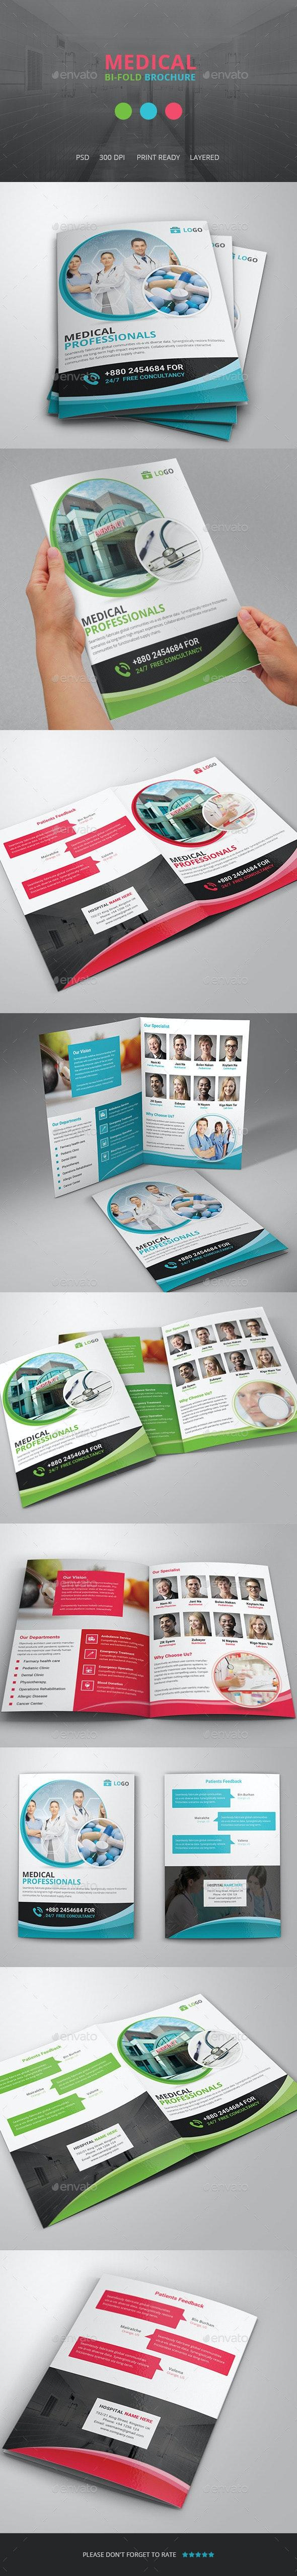 Medical Bi fold Brochure Template - Brochures Print Templates